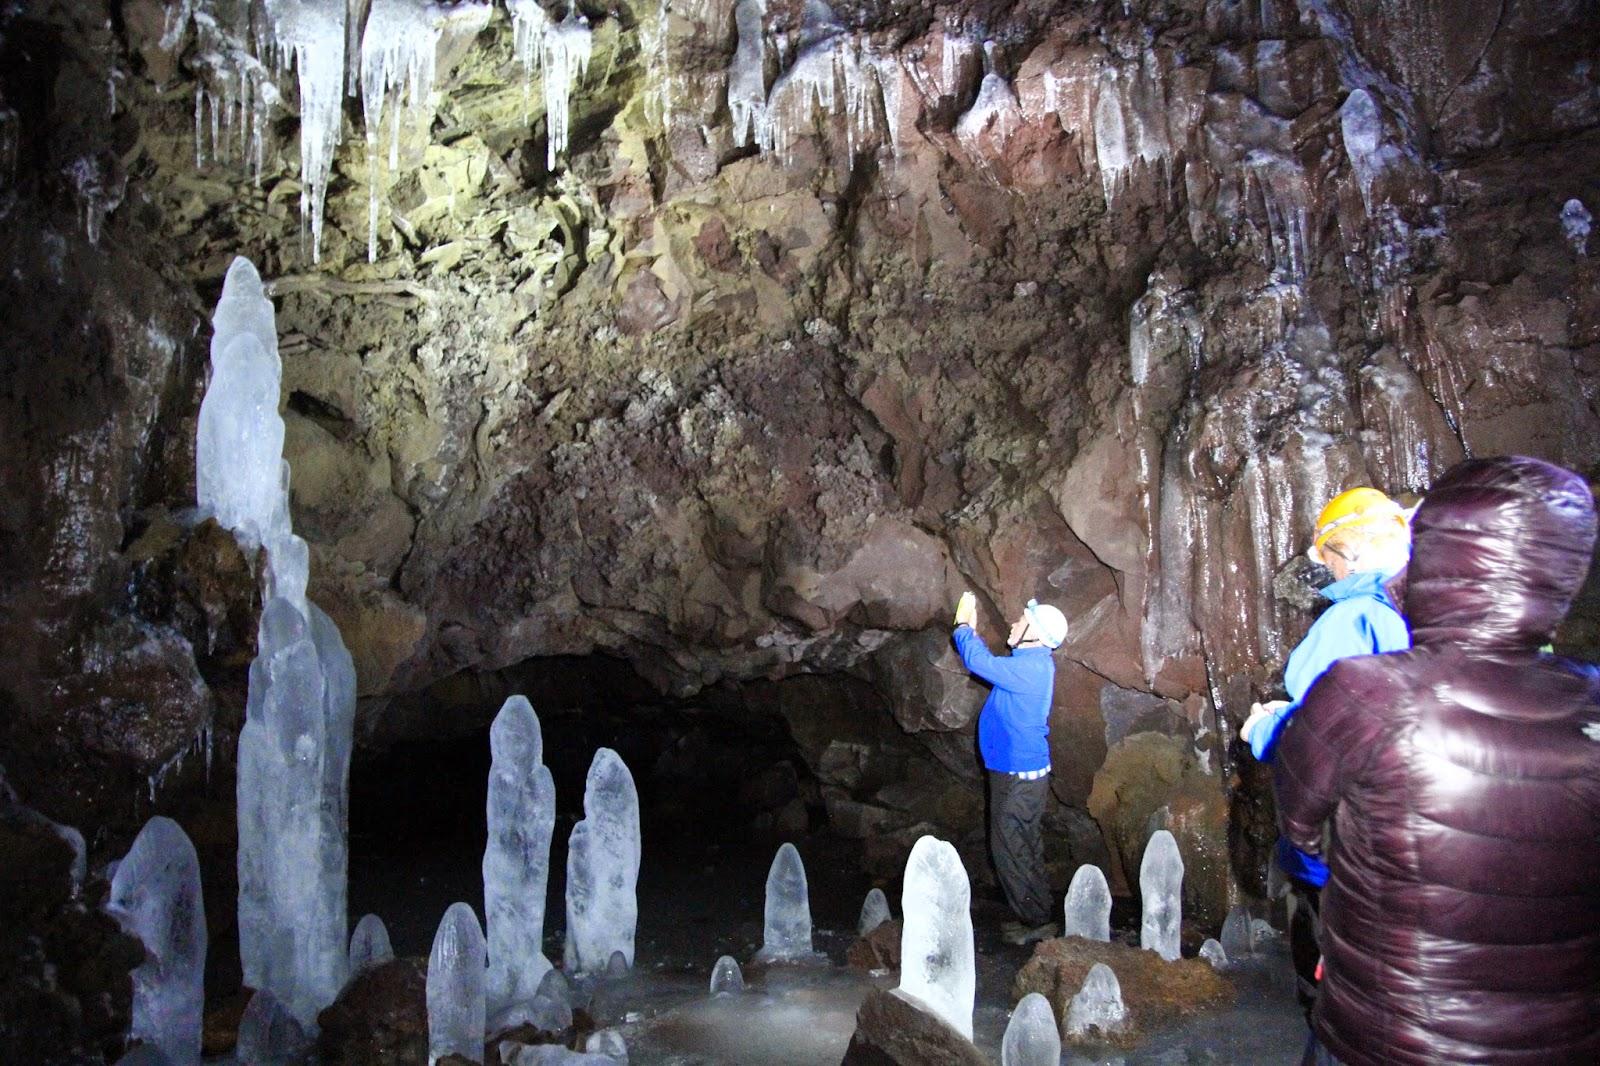 LOFTHERLLIR CAVE - Explorando uma gruta de lava com uma Rock Star em Lofthellir | Islândia